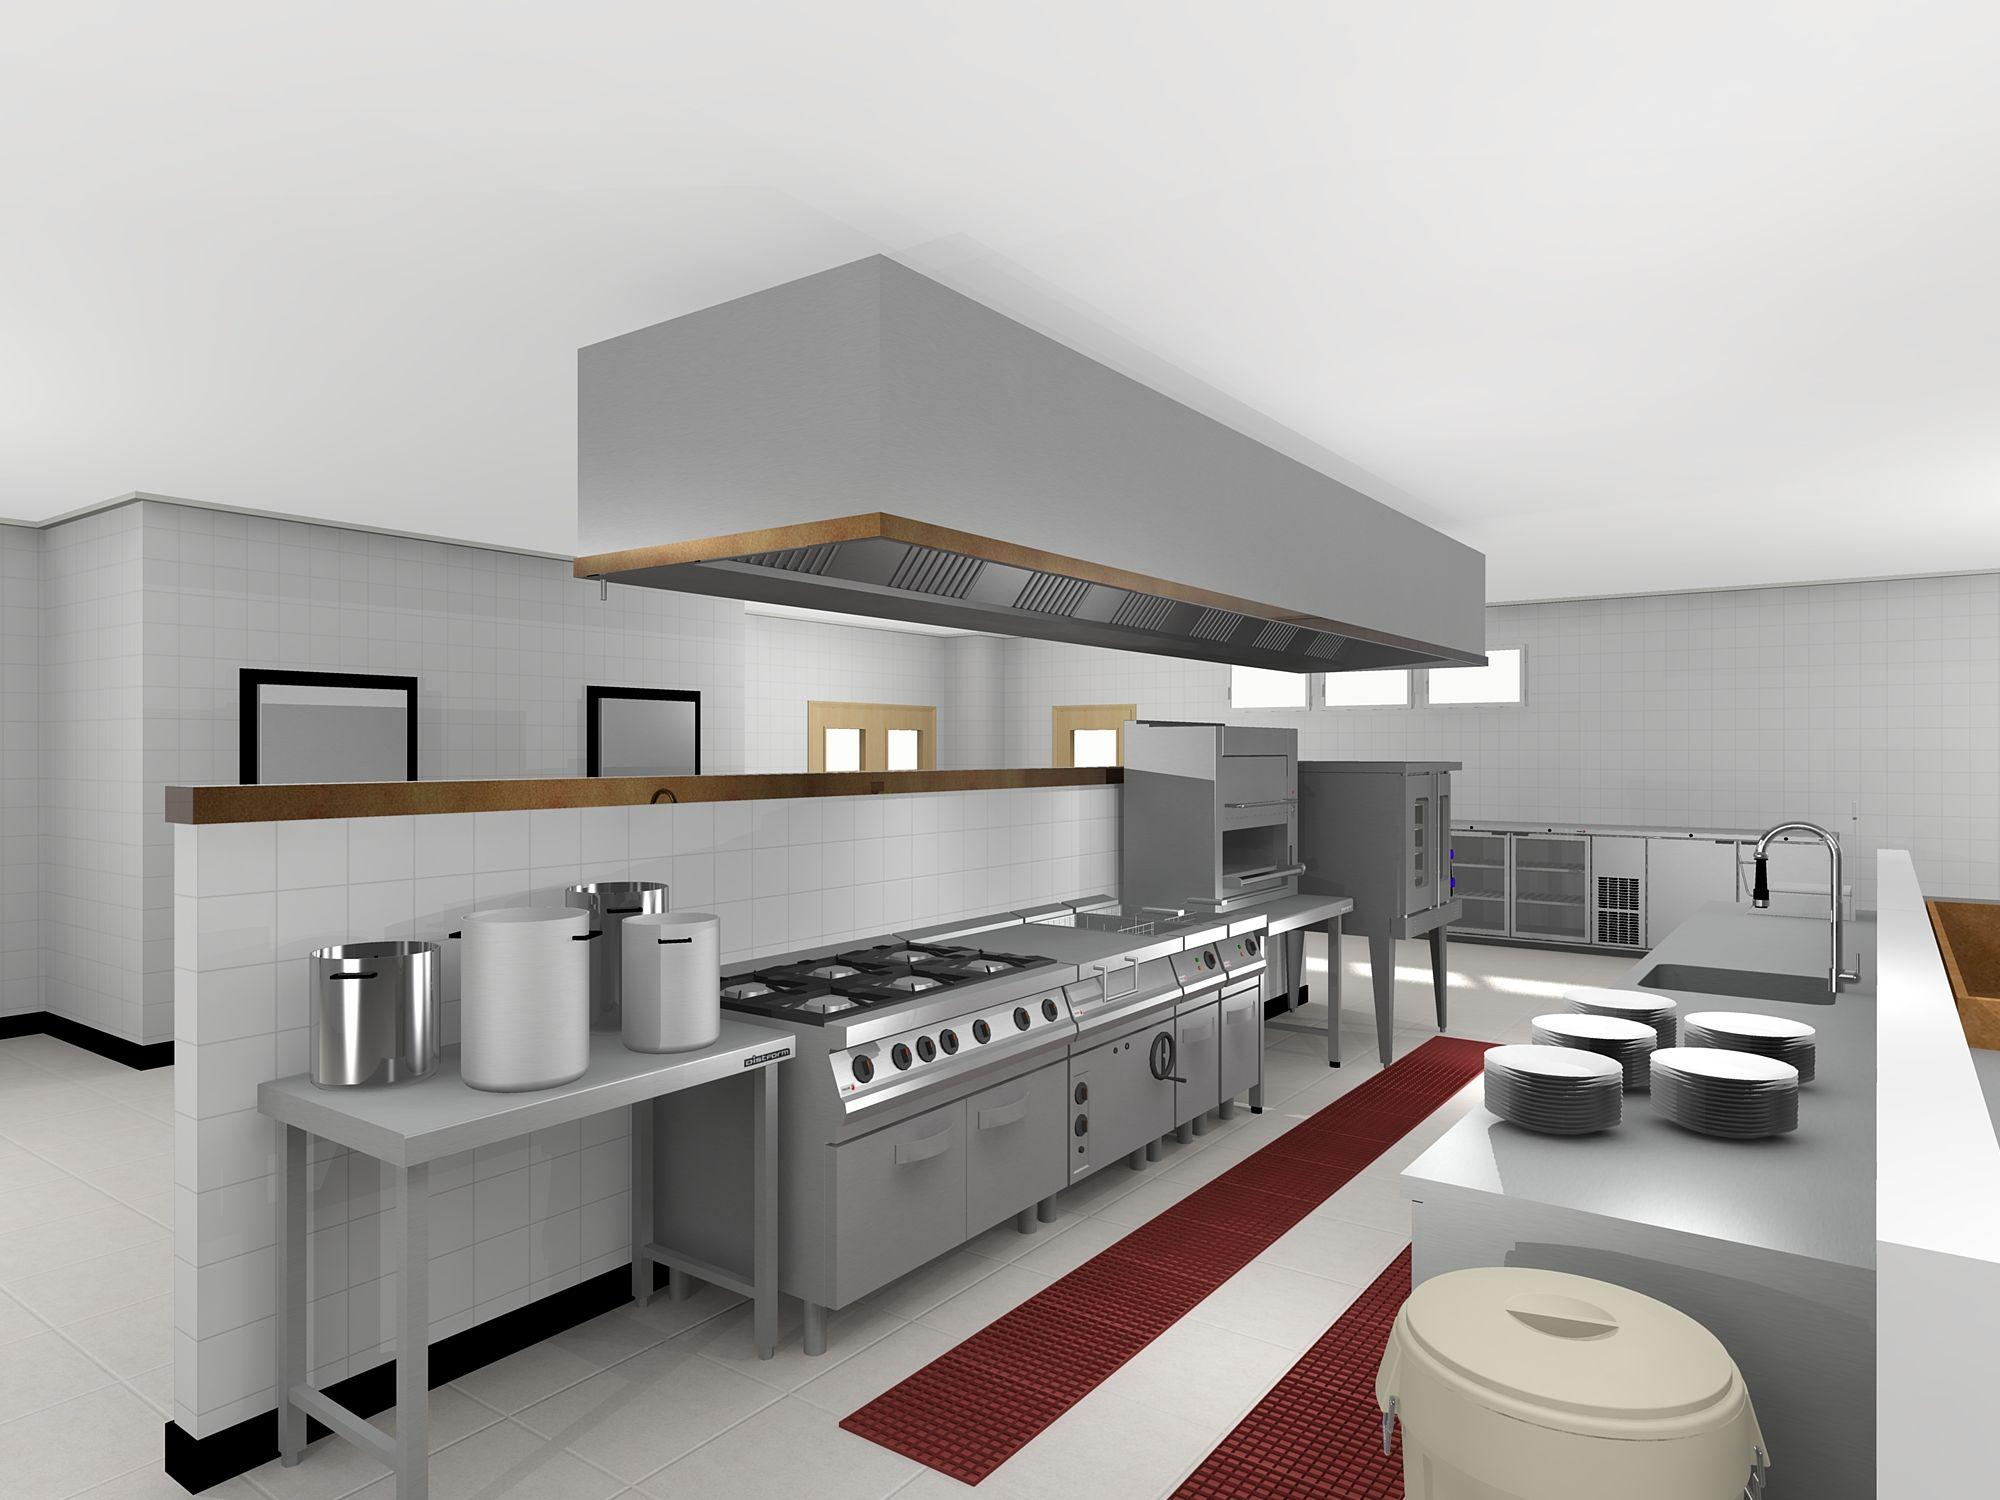 Commercial Home Kitchens Kitchen Design Picture Images For Mesmerizing Kitchen  Design Commercial 2018